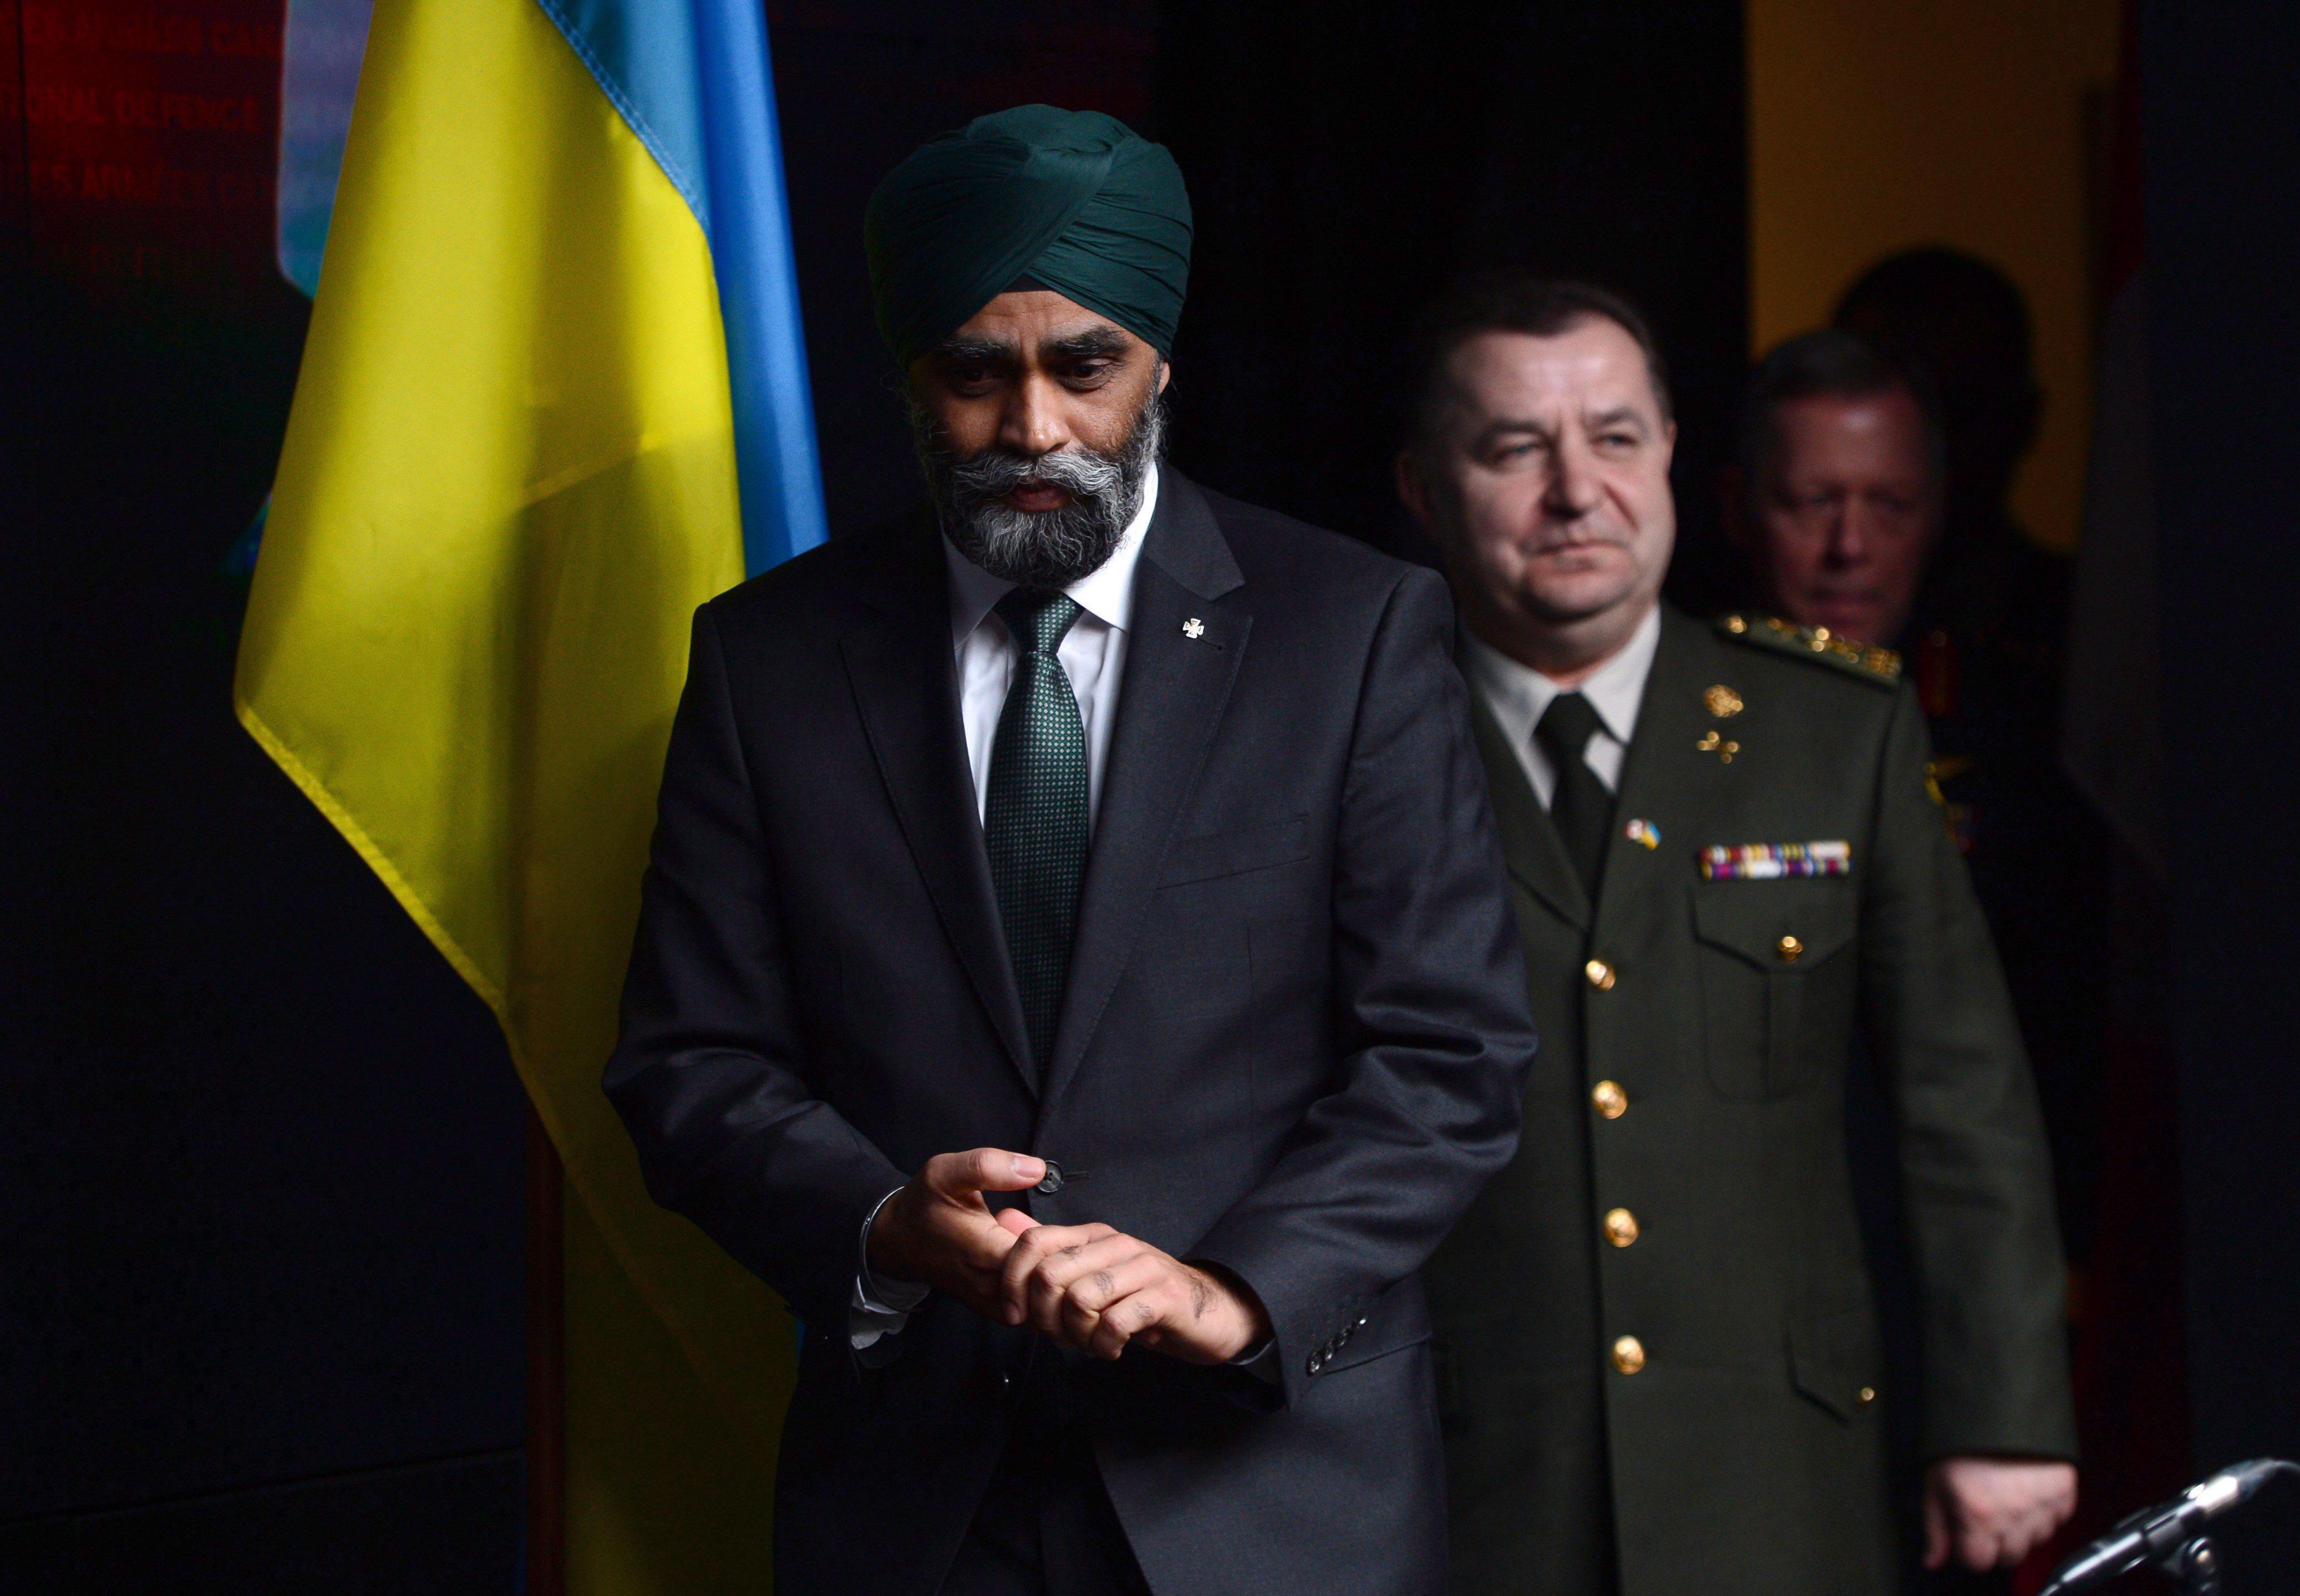 Defence Minister Harjit Sajjan and his Ukrainian counterpart, Defence Minister Stepan Poltorak, meet...